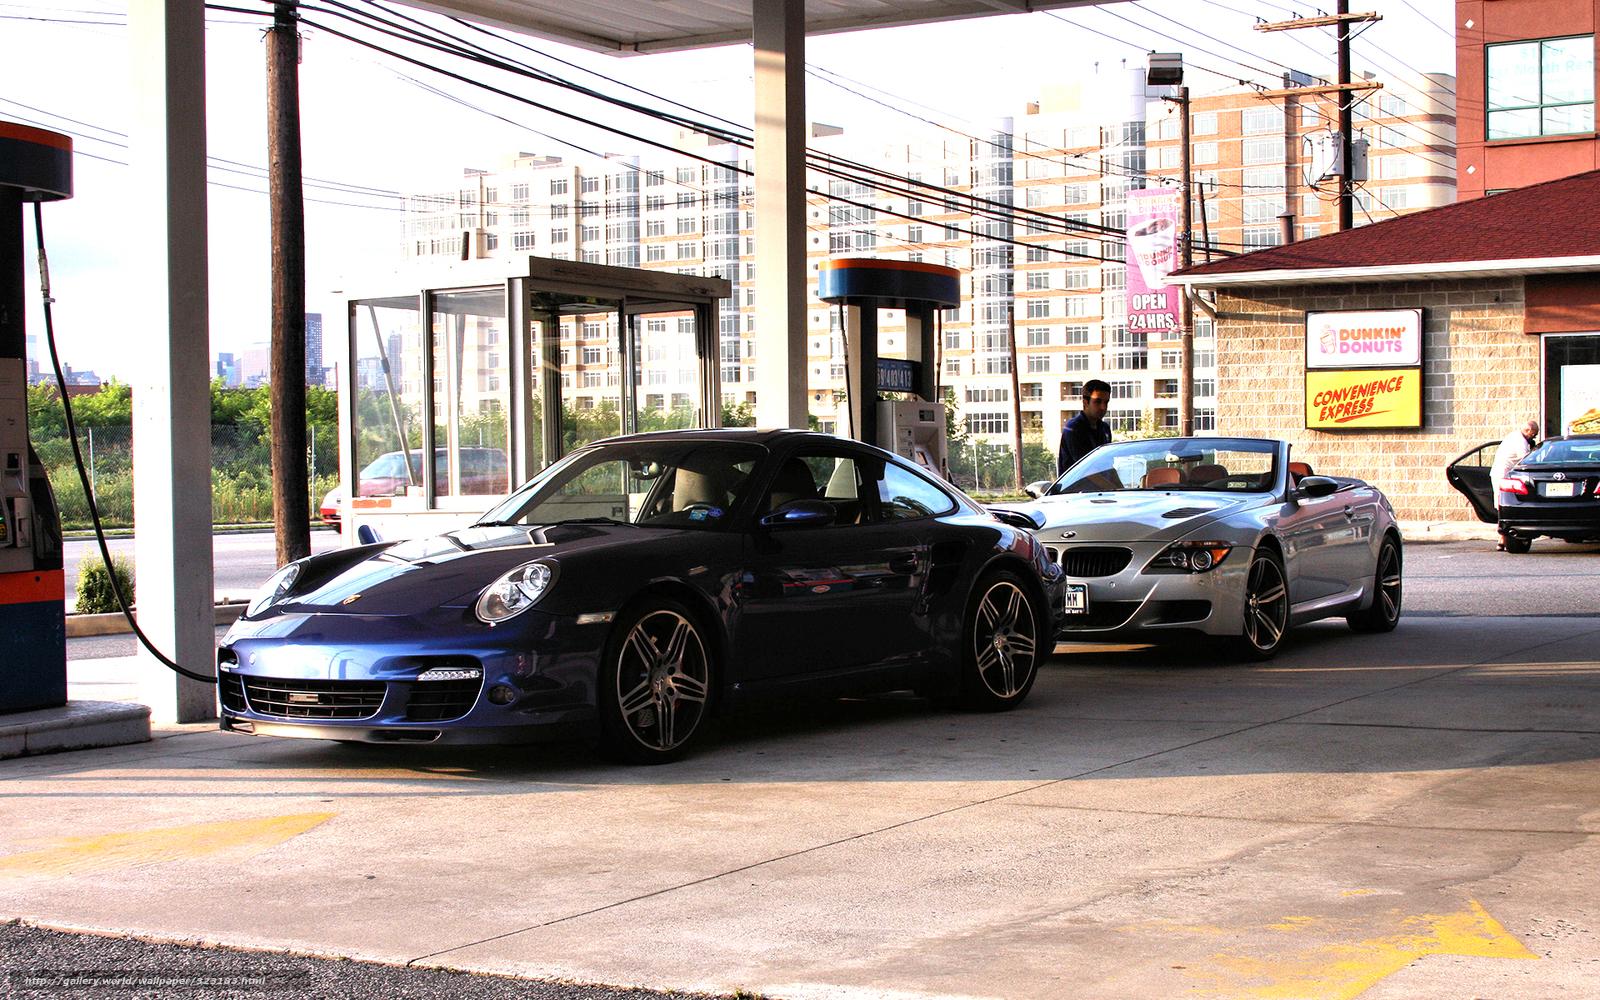 Download wallpaper porsche,  cars,  machinery,  Car free desktop wallpaper in the resolution 1920x1200 — picture №323183